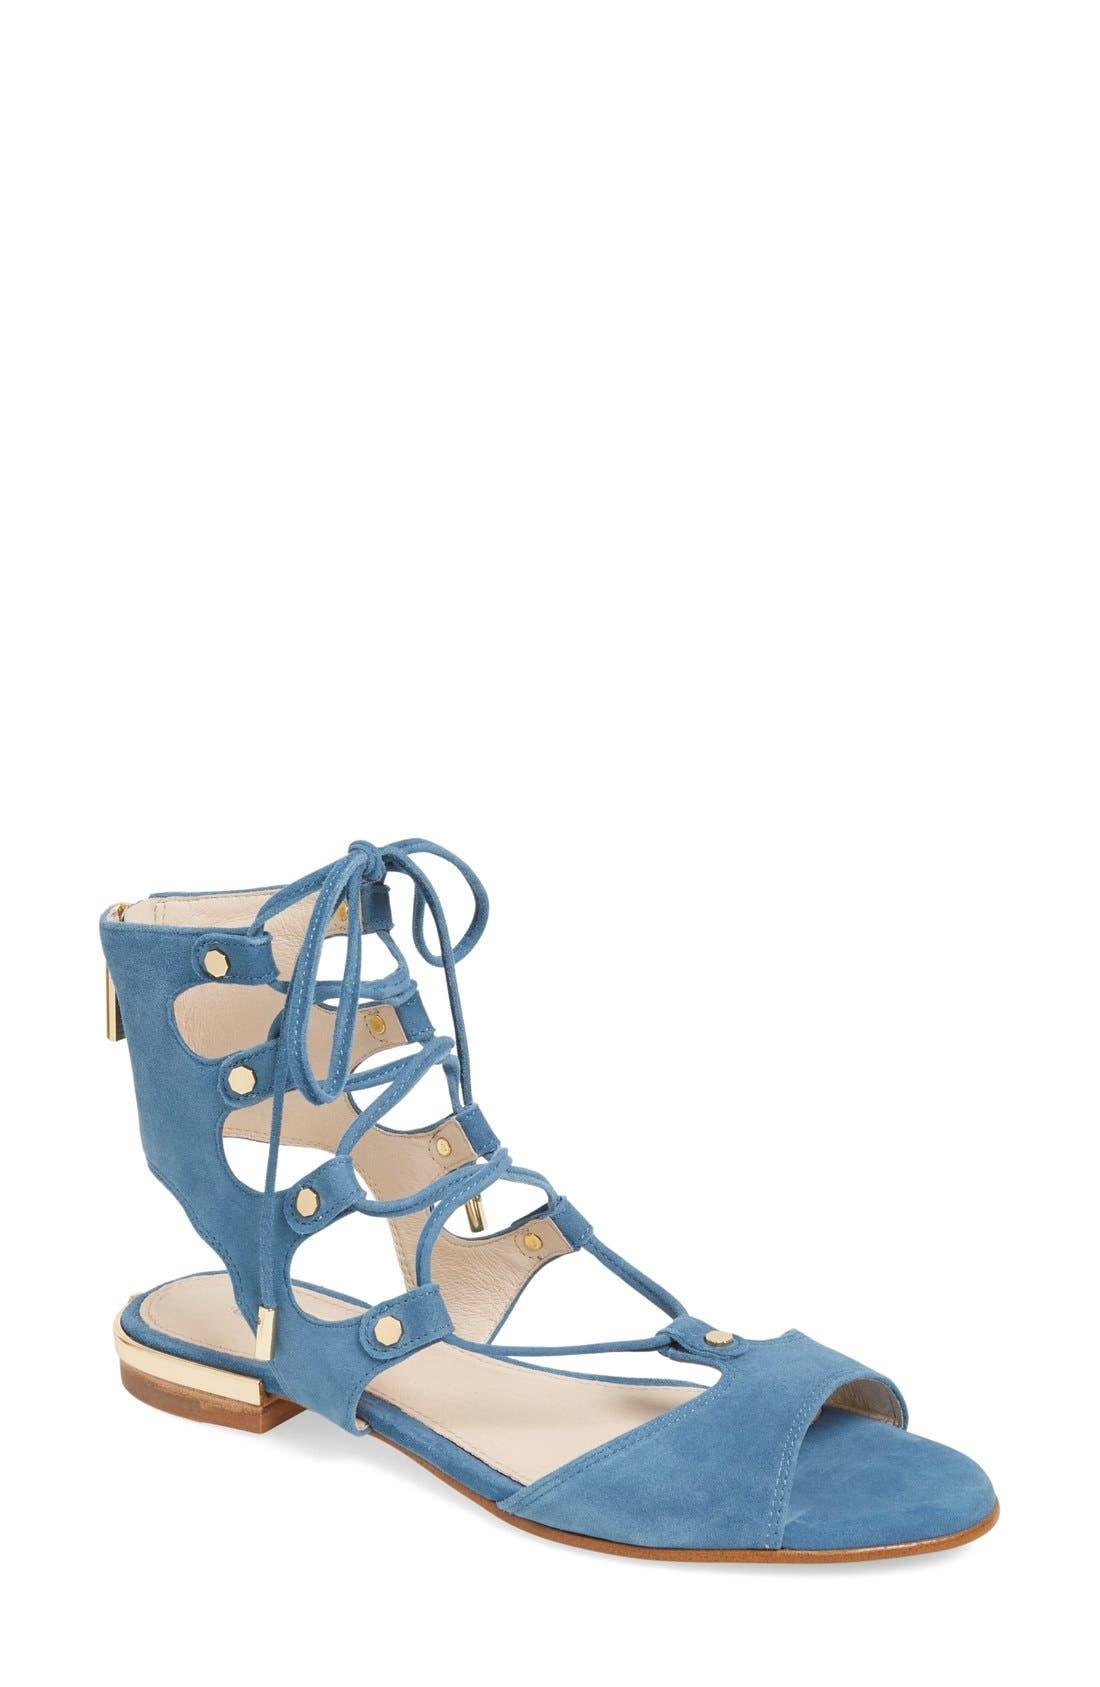 Alternate Image 1 Selected - Louise et Cie 'Ashlyn' Ghillie Sandal (Women)